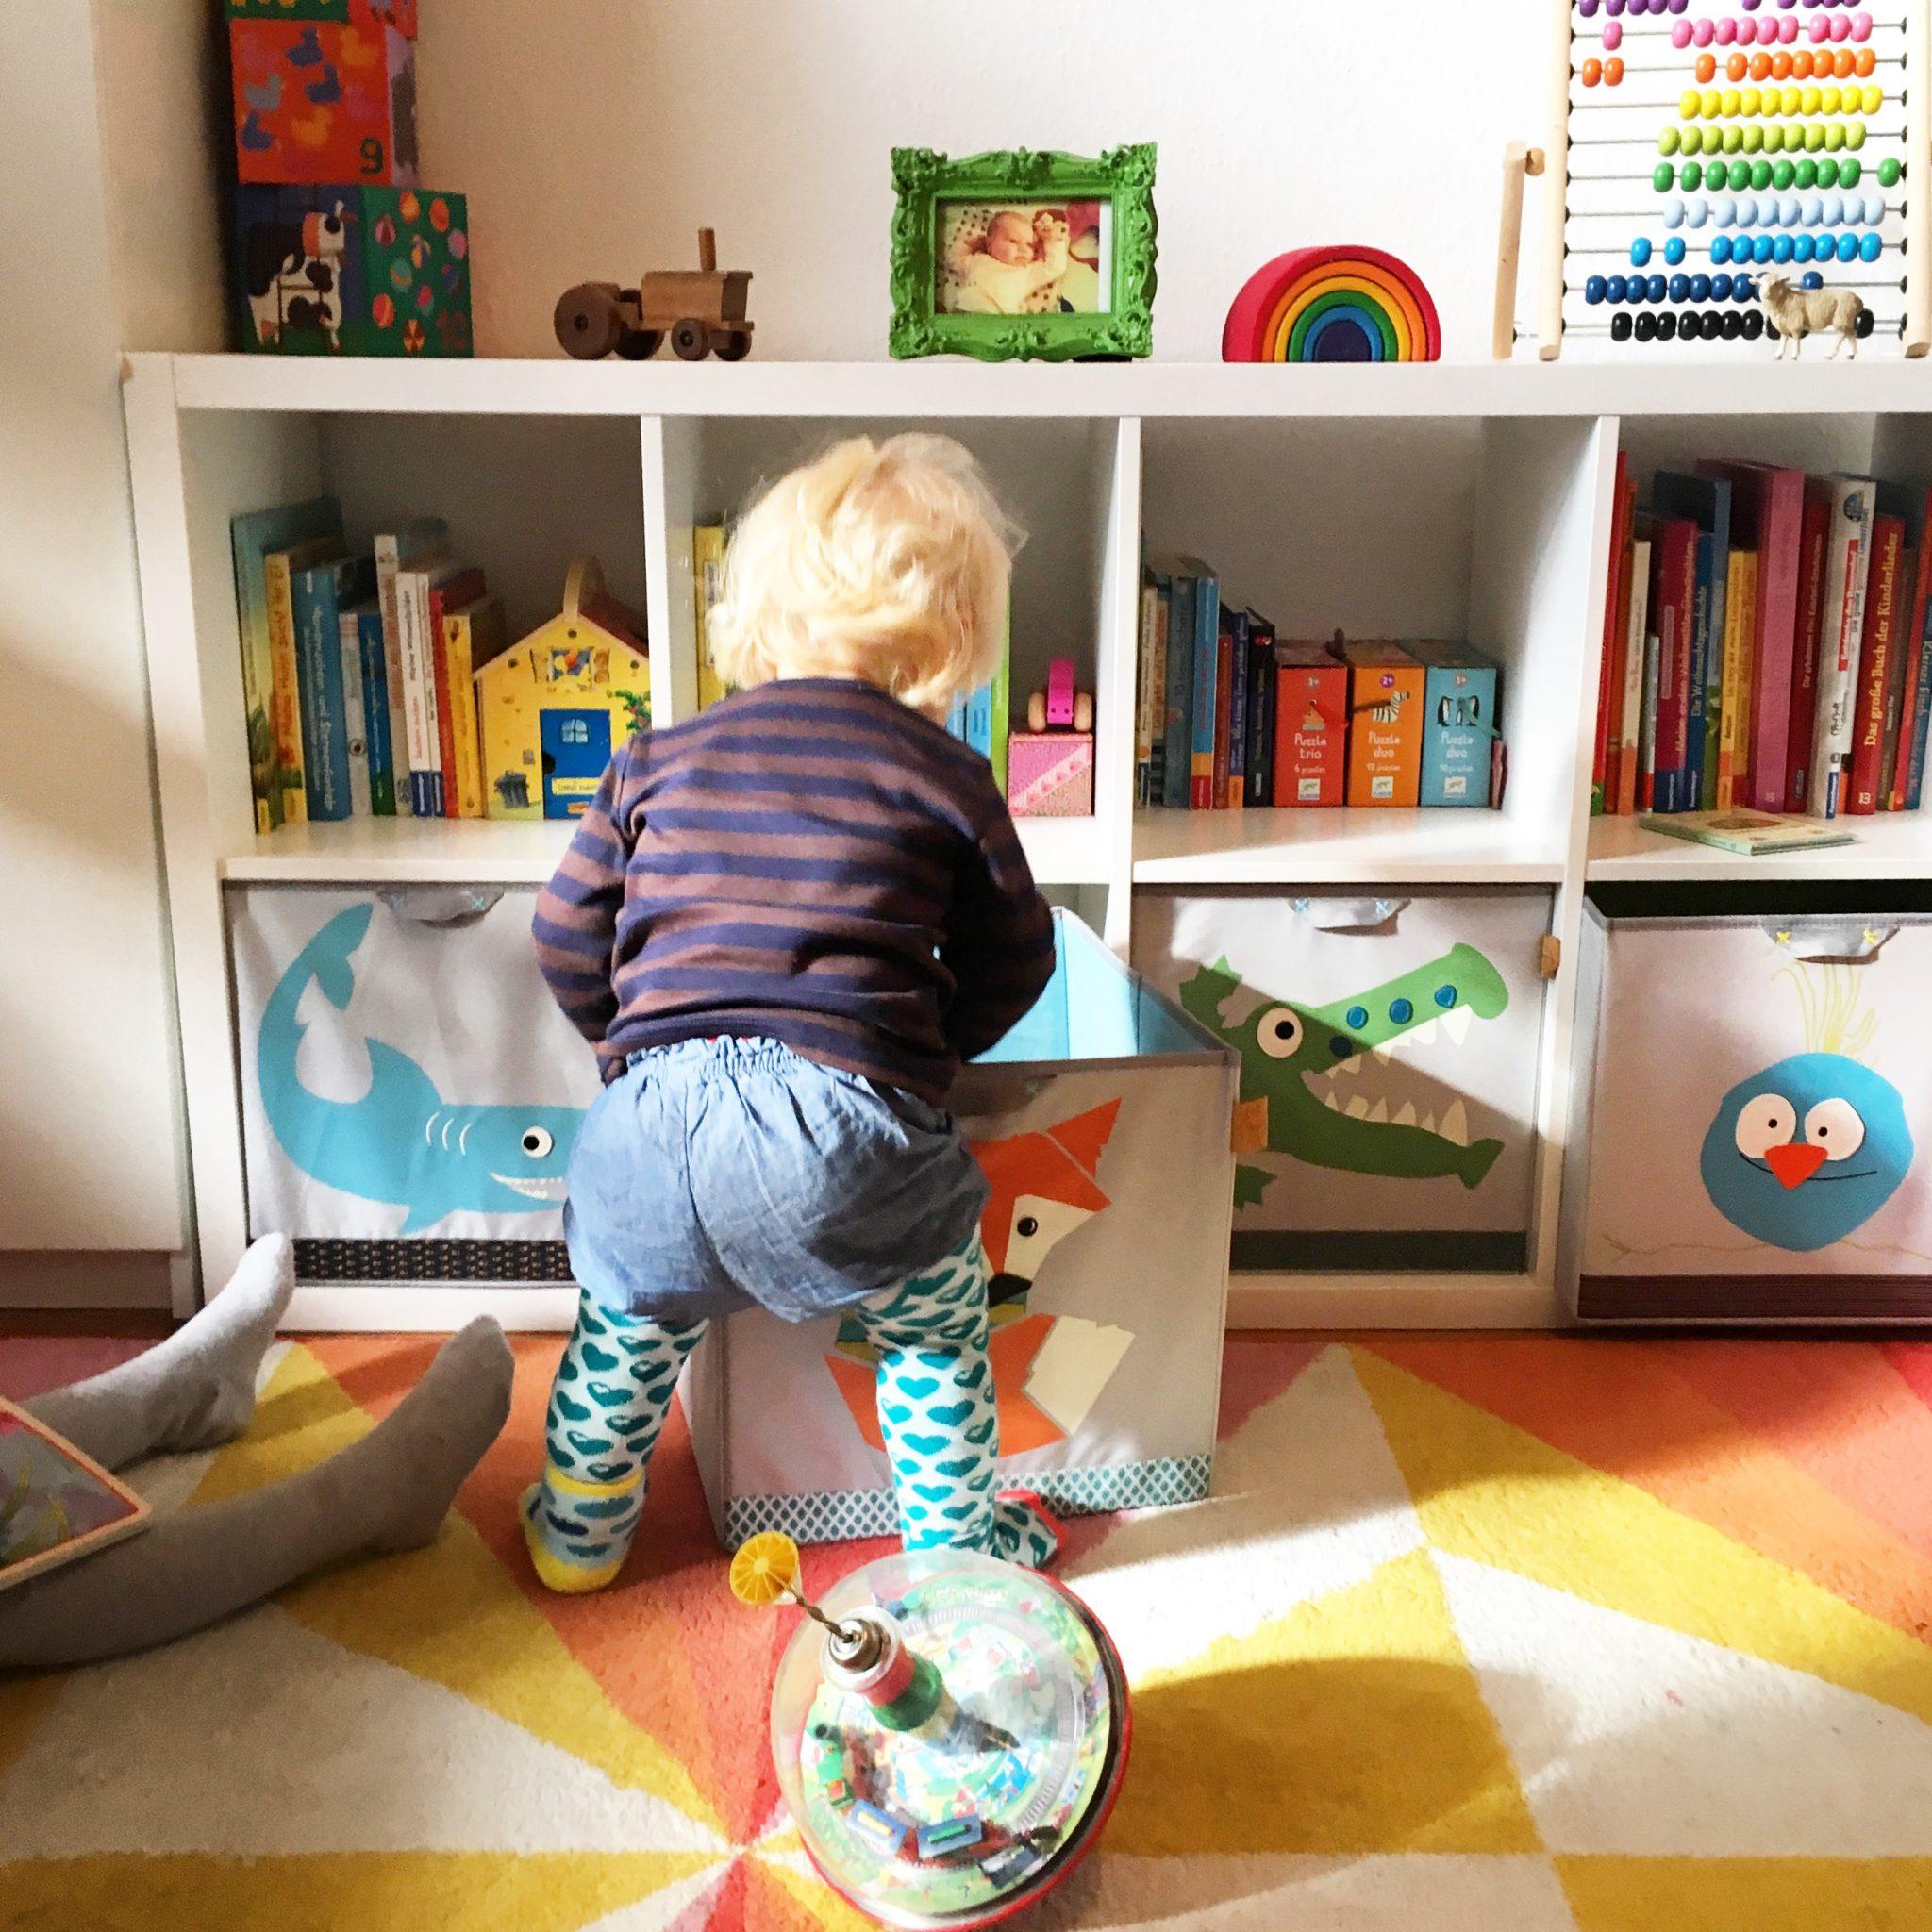 aufraeumen mit kindern laessig system1 sarahplusdrei. Black Bedroom Furniture Sets. Home Design Ideas